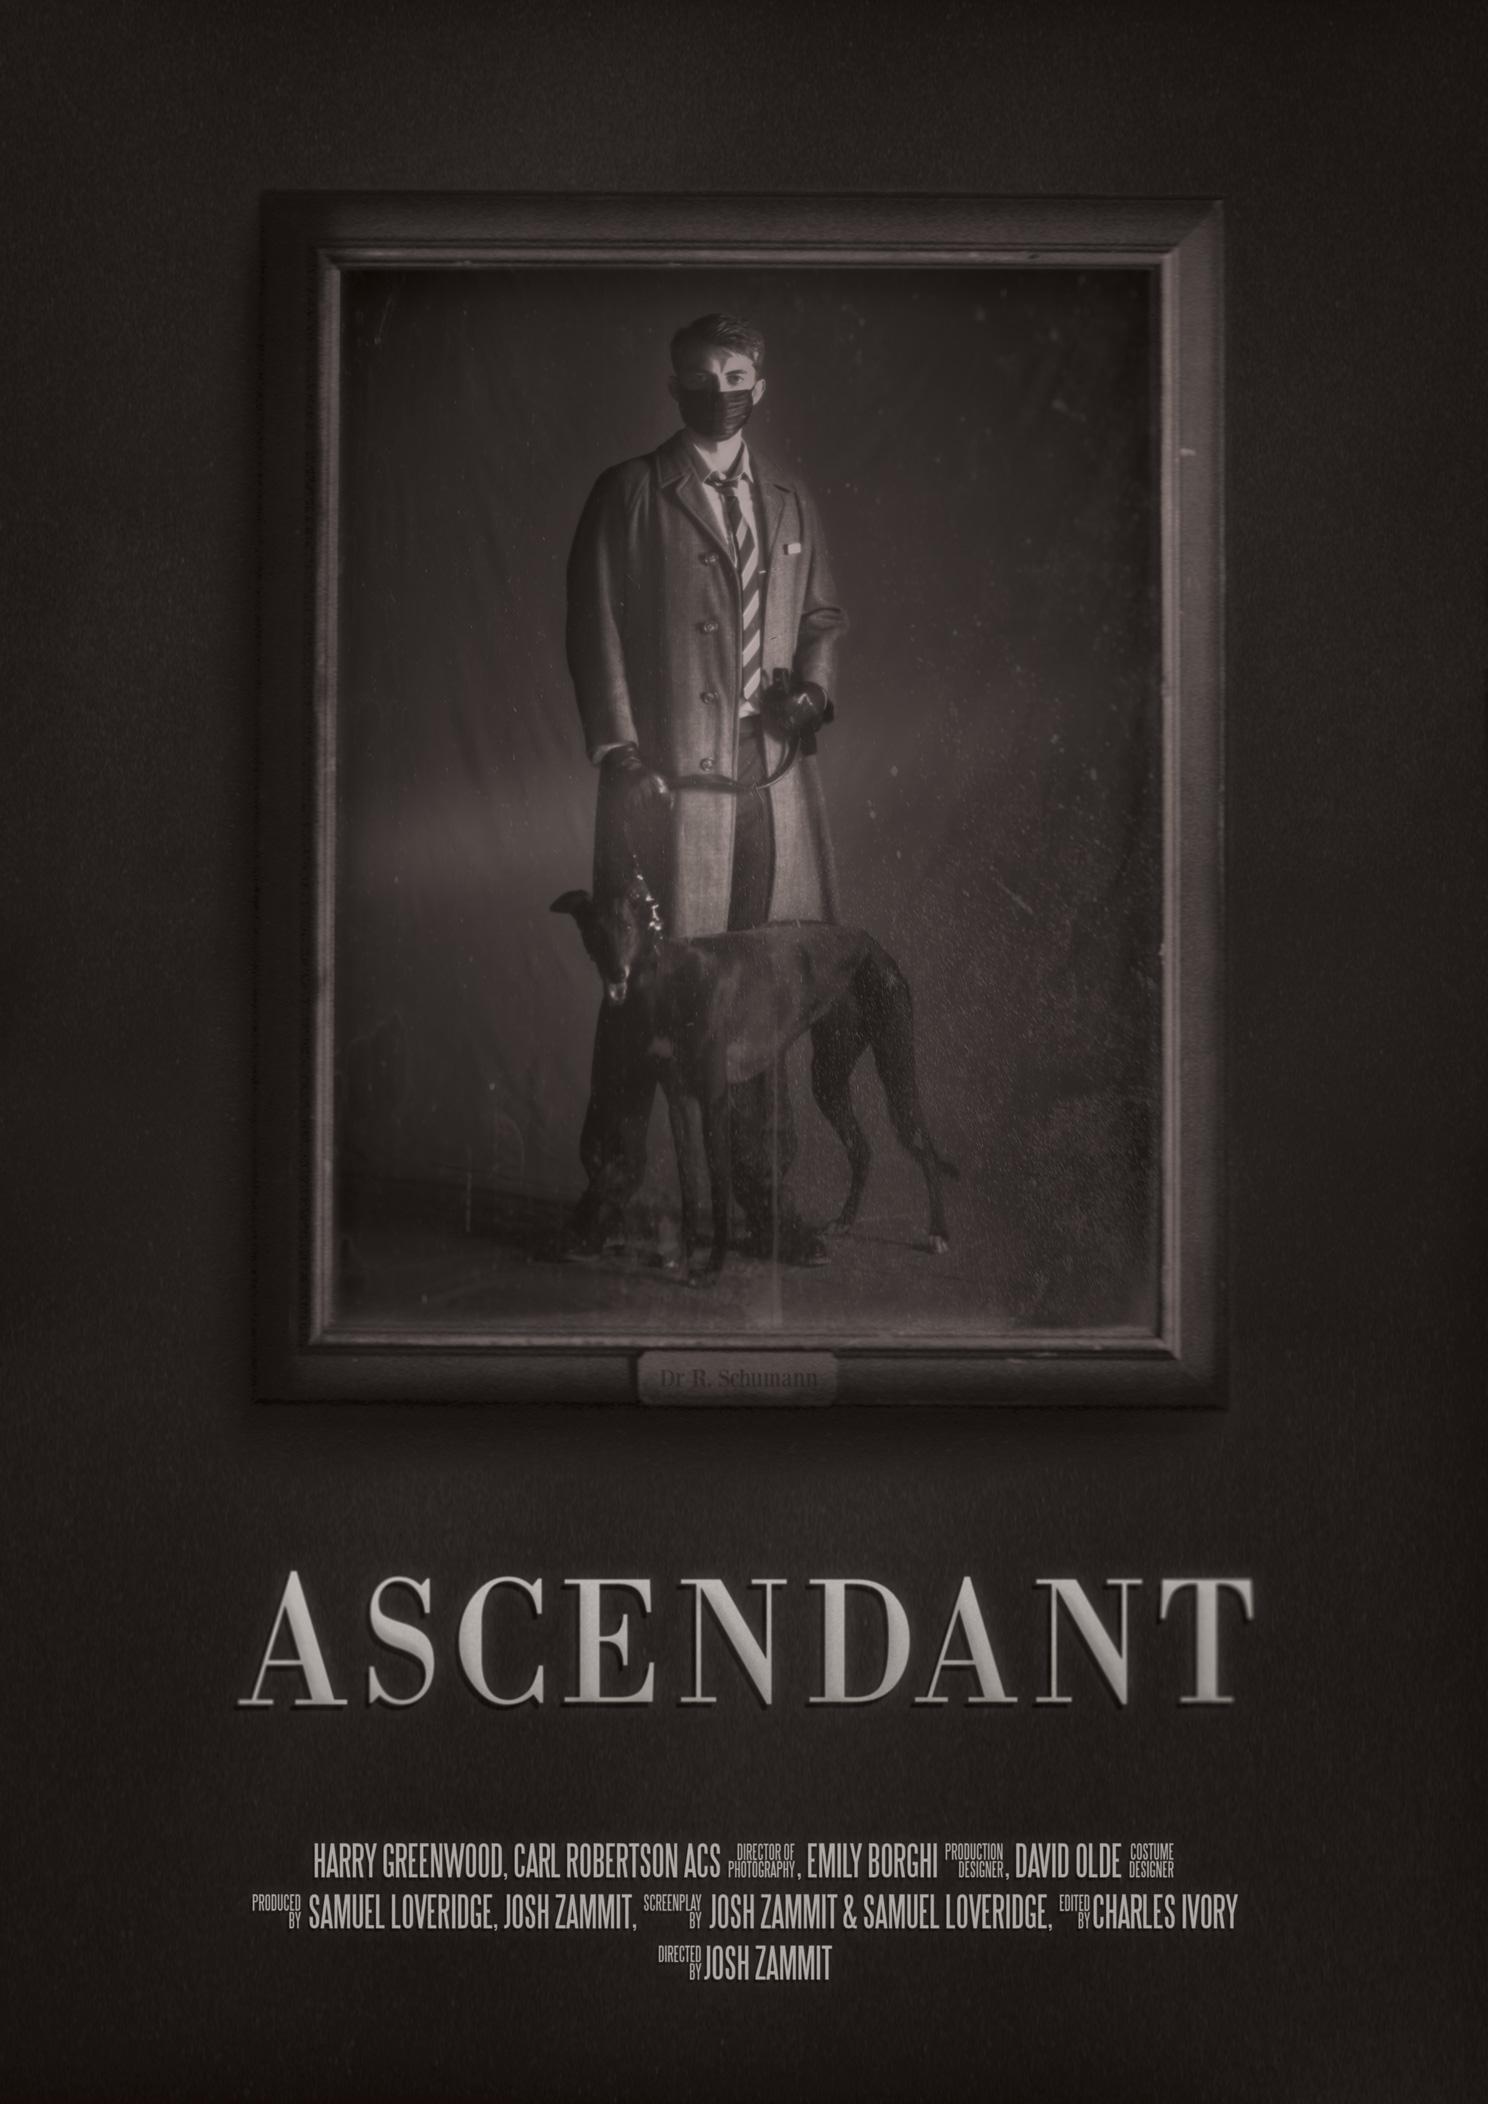 Ascendant official poster